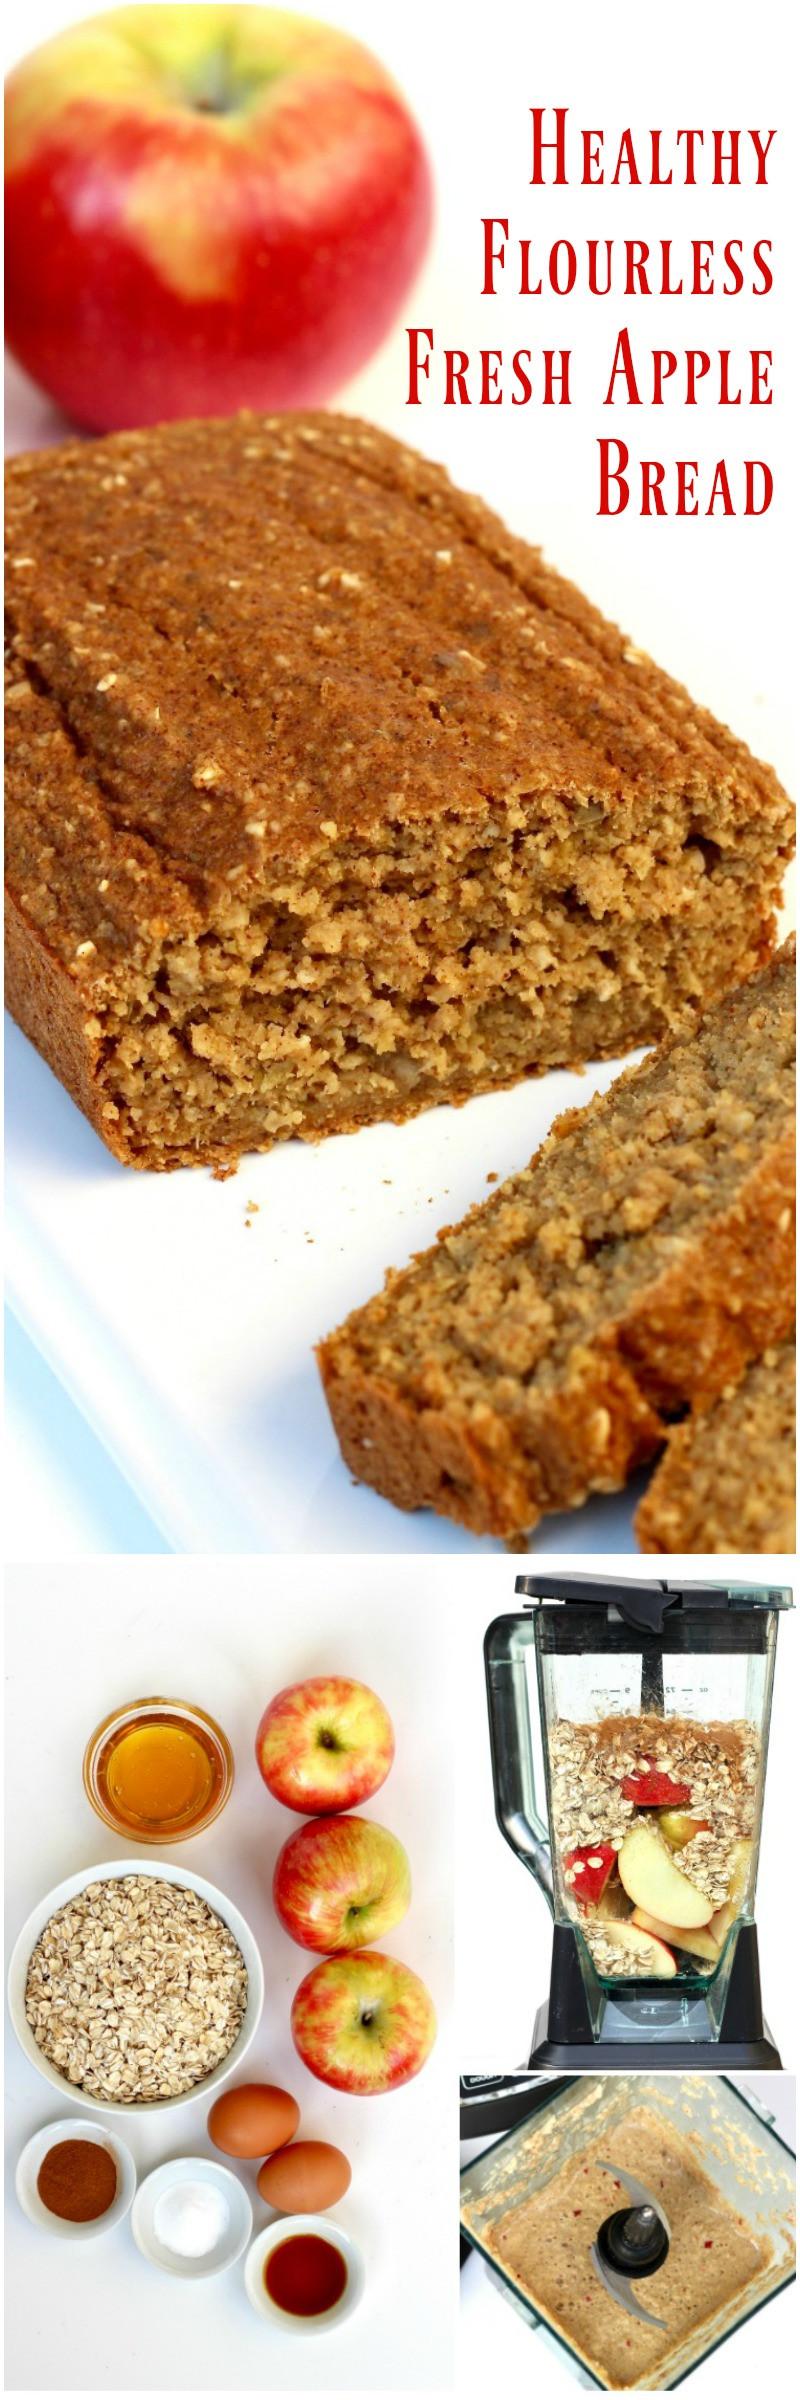 Apple Bread Healthy  Healthy Flourless Fresh Apple Bread TheDirtyGyro